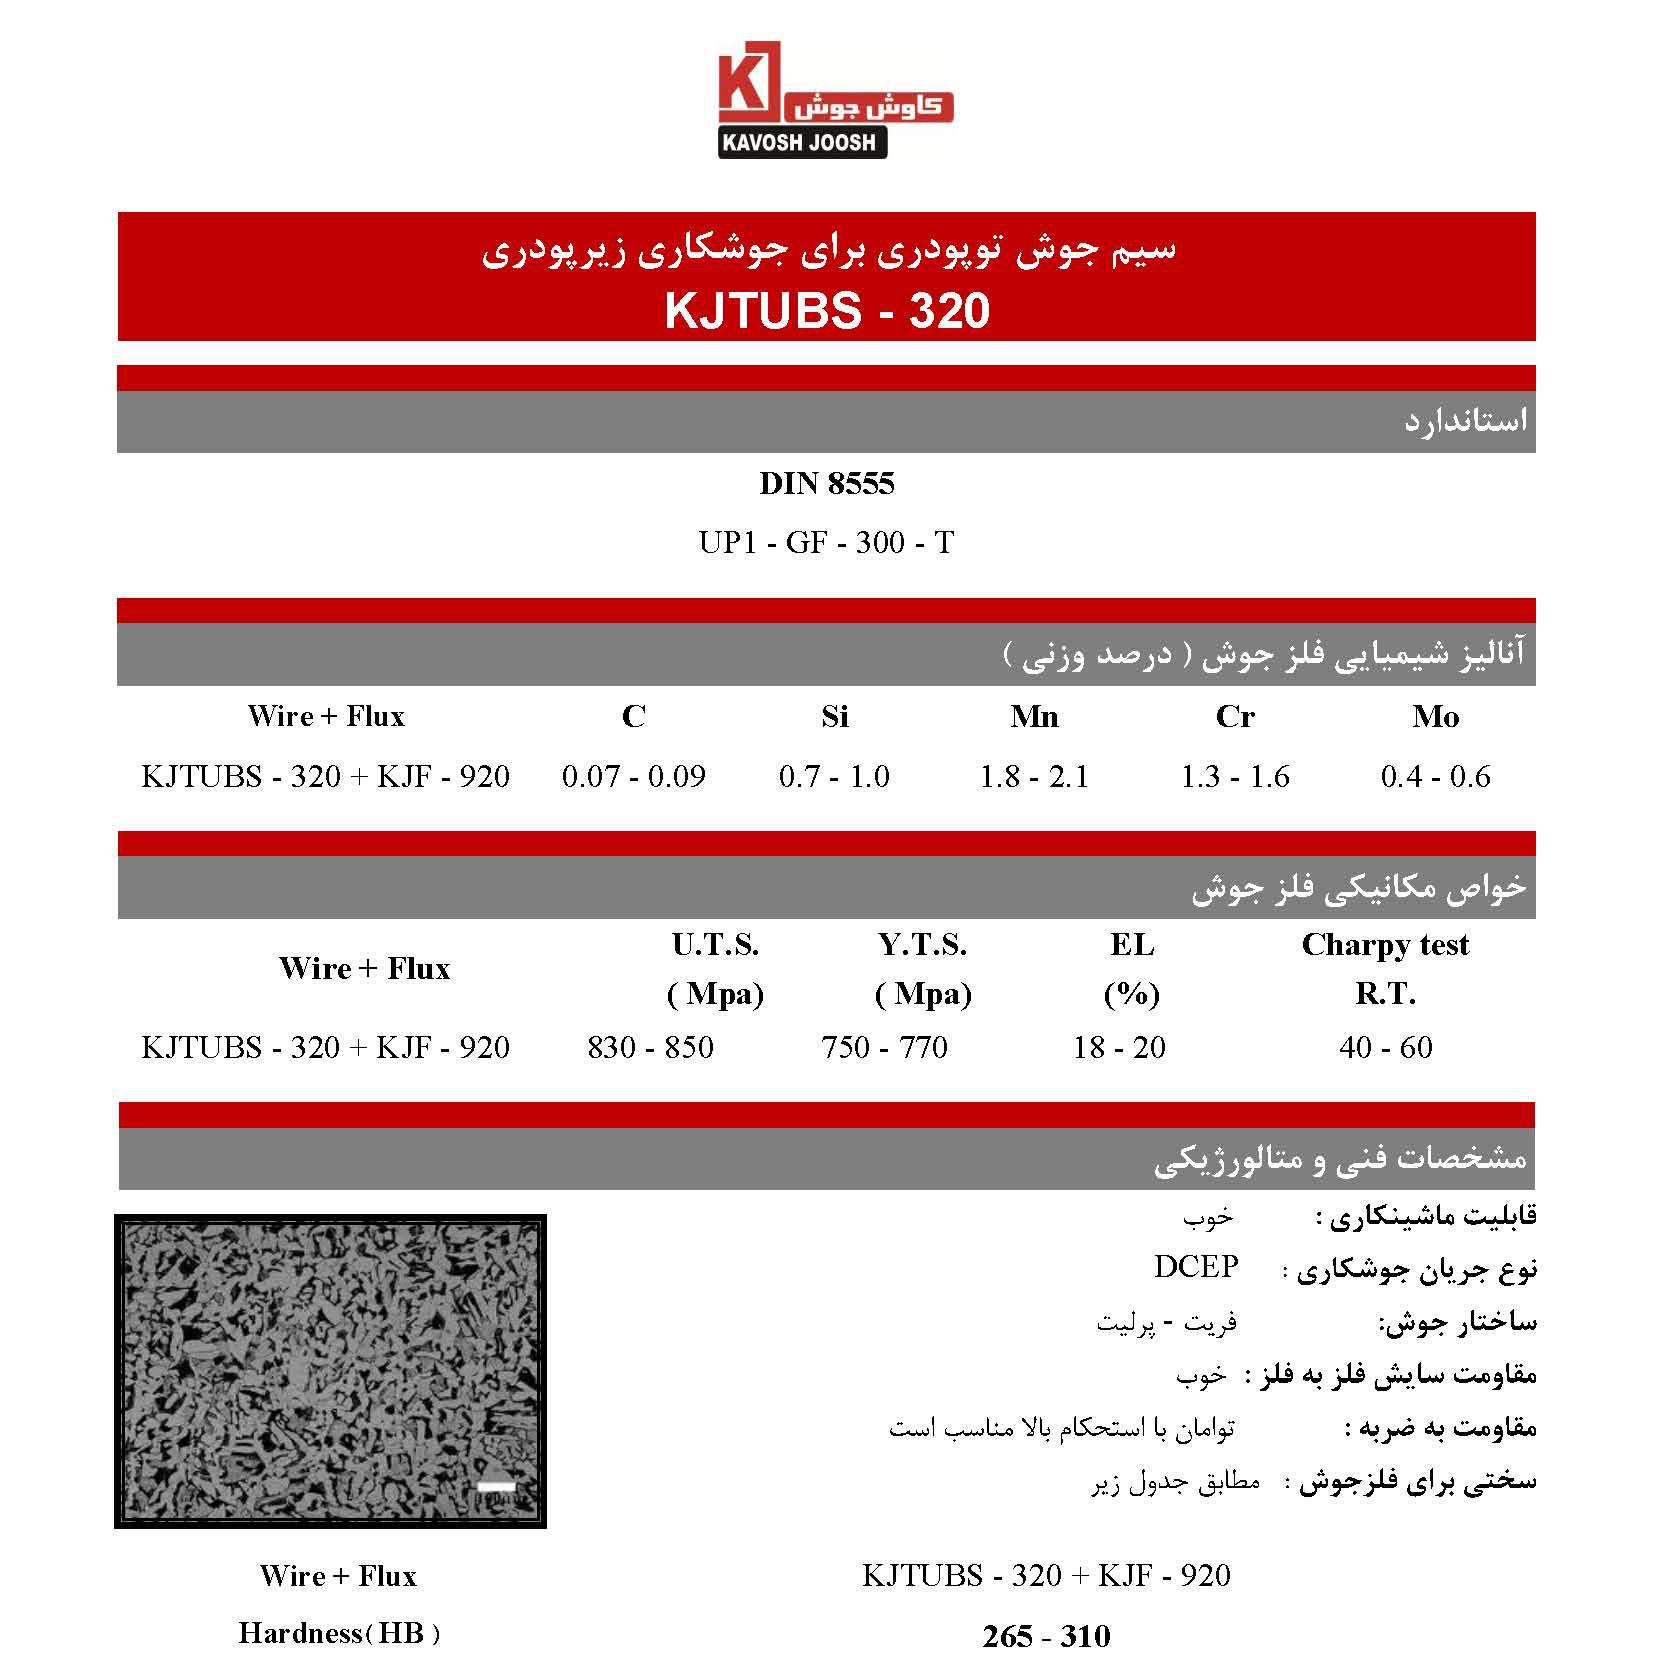 KJTUBS-320